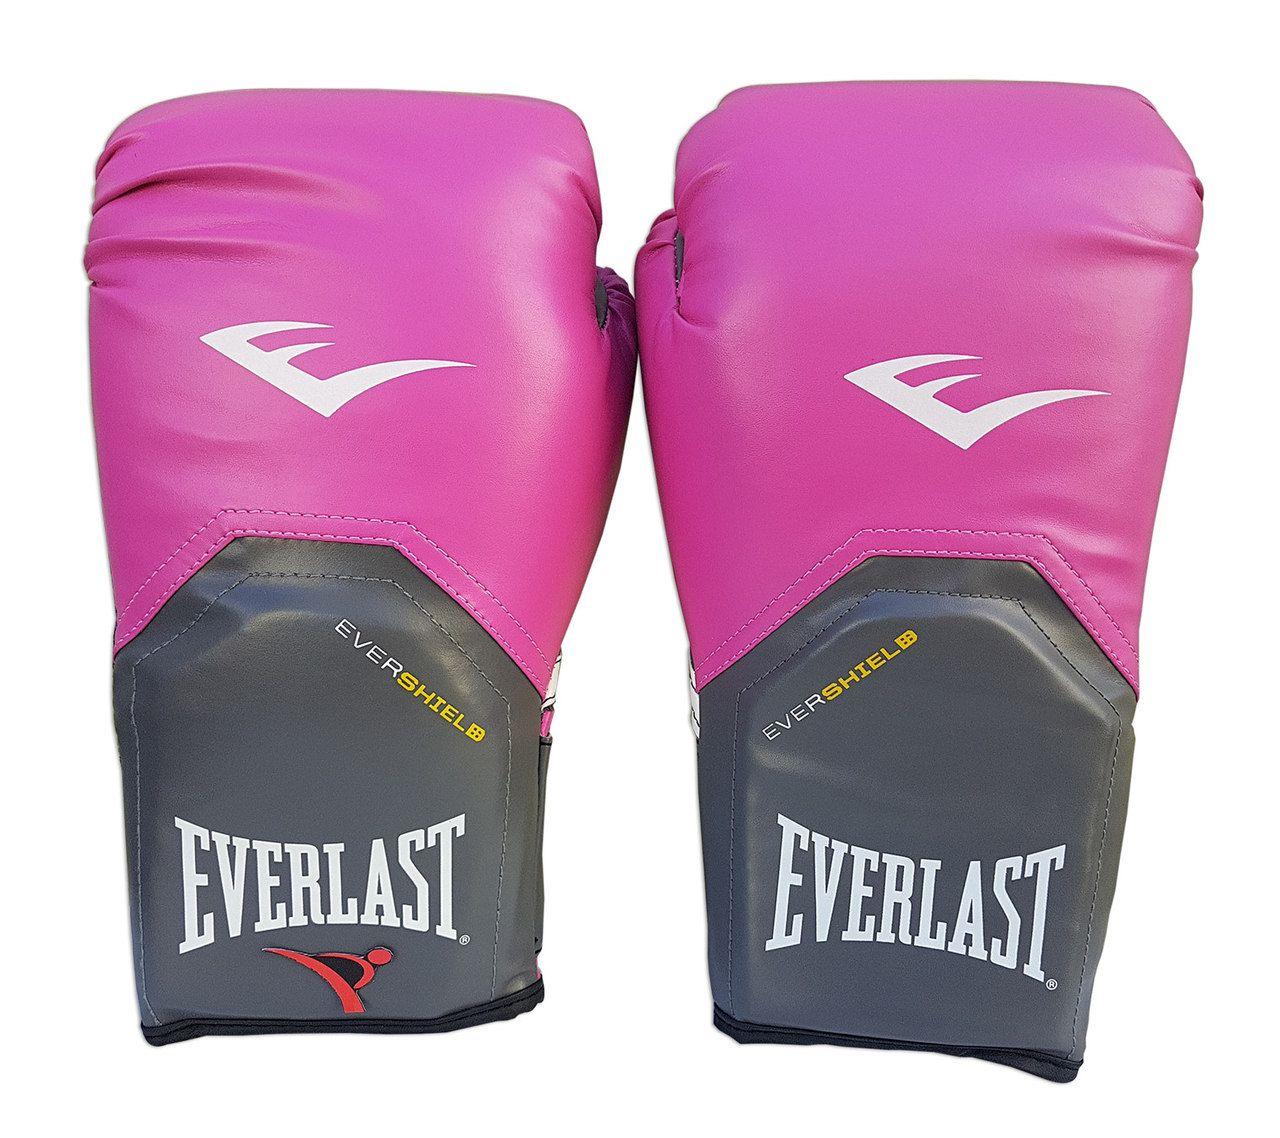 Luva de Boxe / Muay Thai Feminina 08oz - Rosa - Pro Style - Everlast  - PRALUTA SHOP